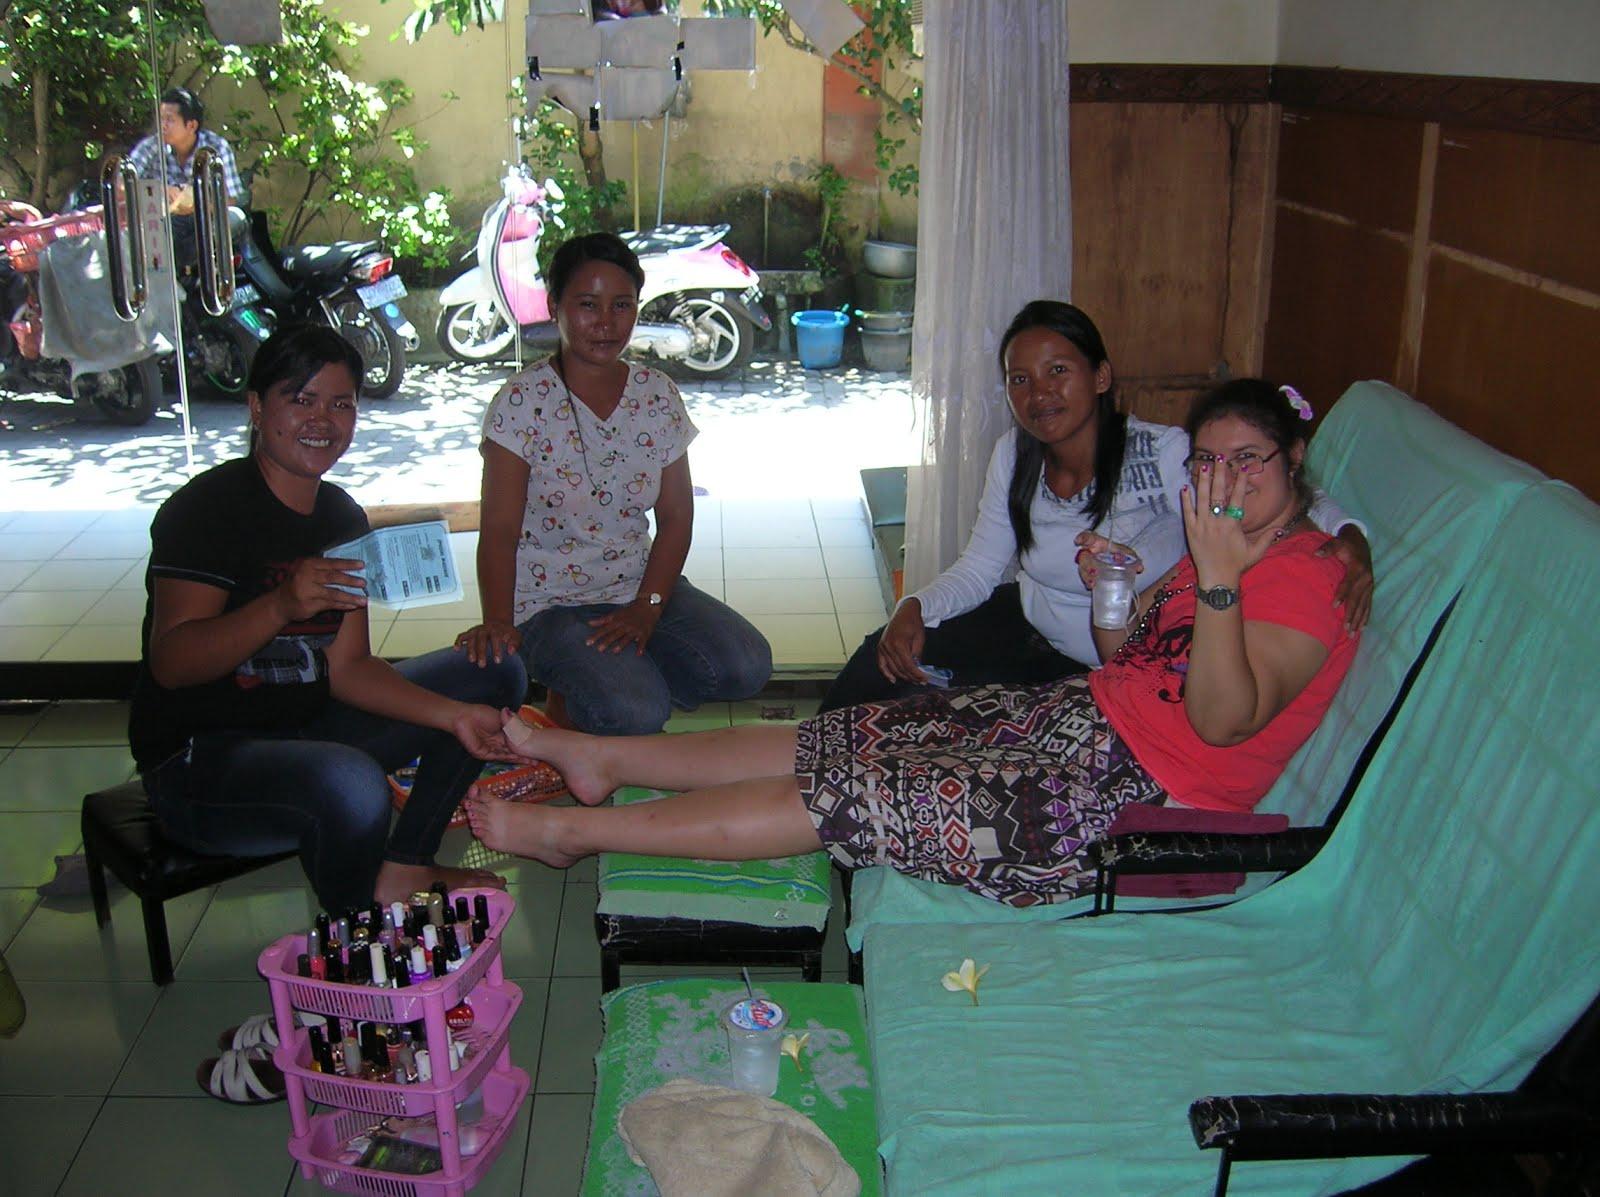 Lisa salon, Bali, vuelta al mundo, round the world, La vuelta al mundo de Asun y Ricardo